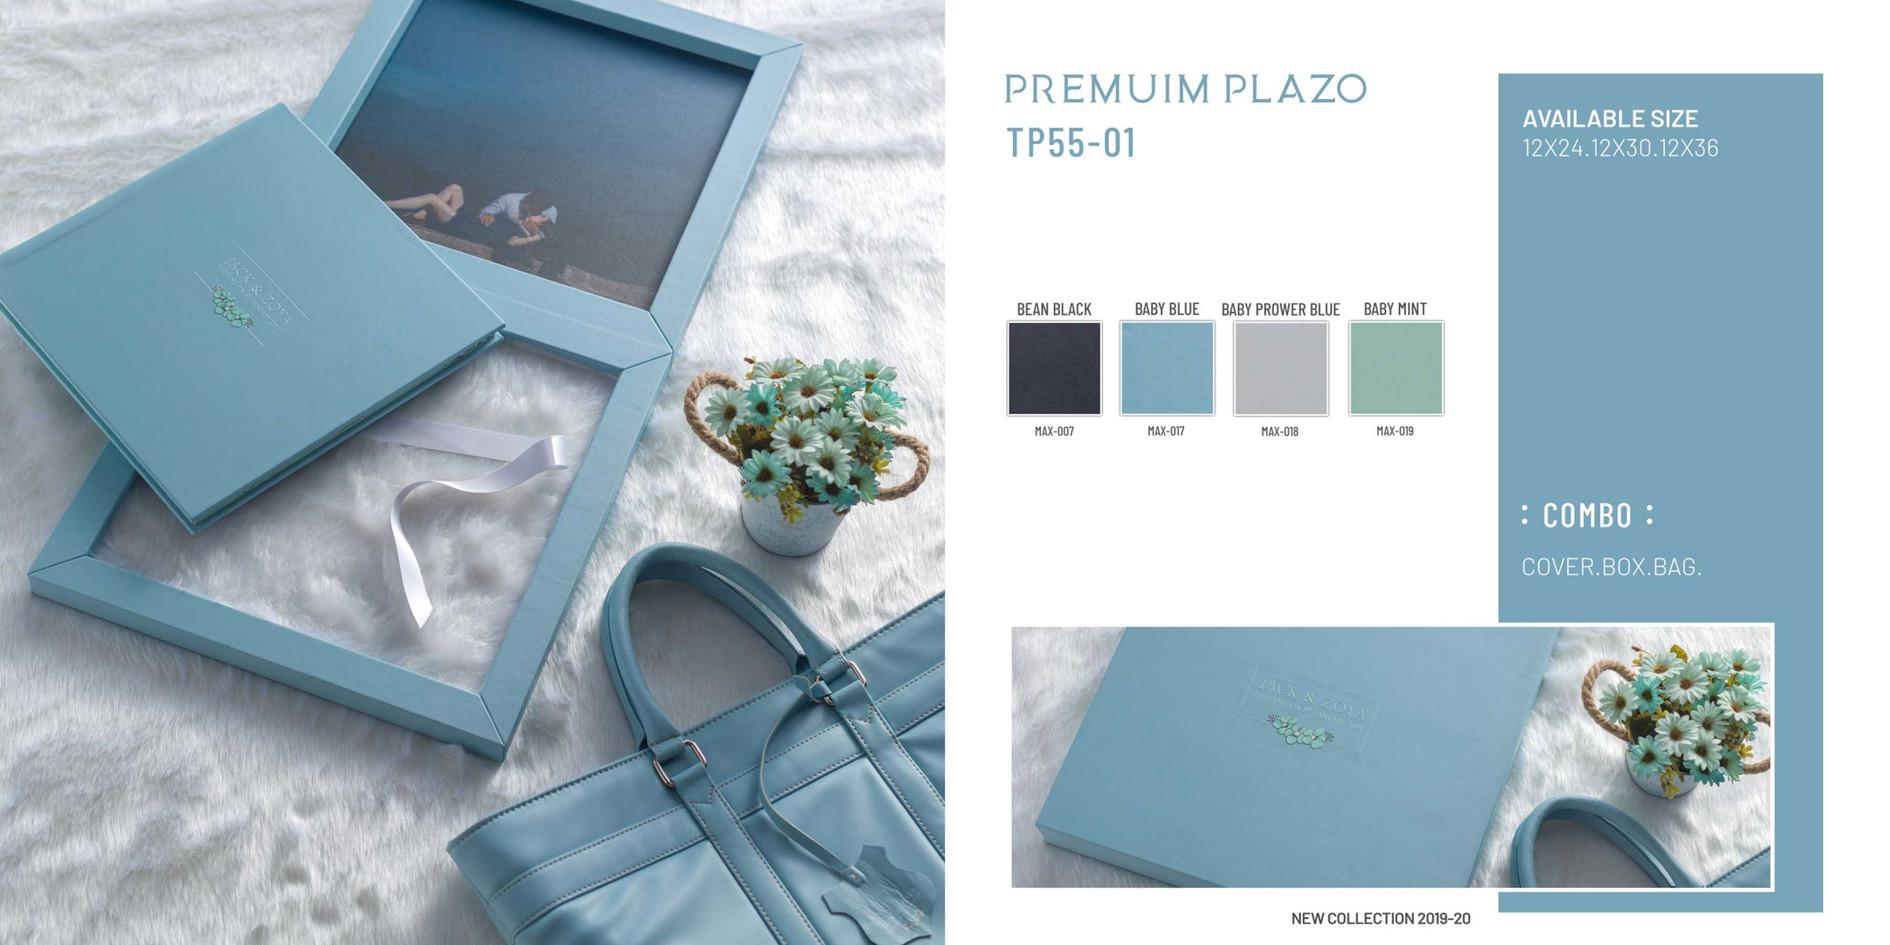 Max Luxury Combo Product-2019-26